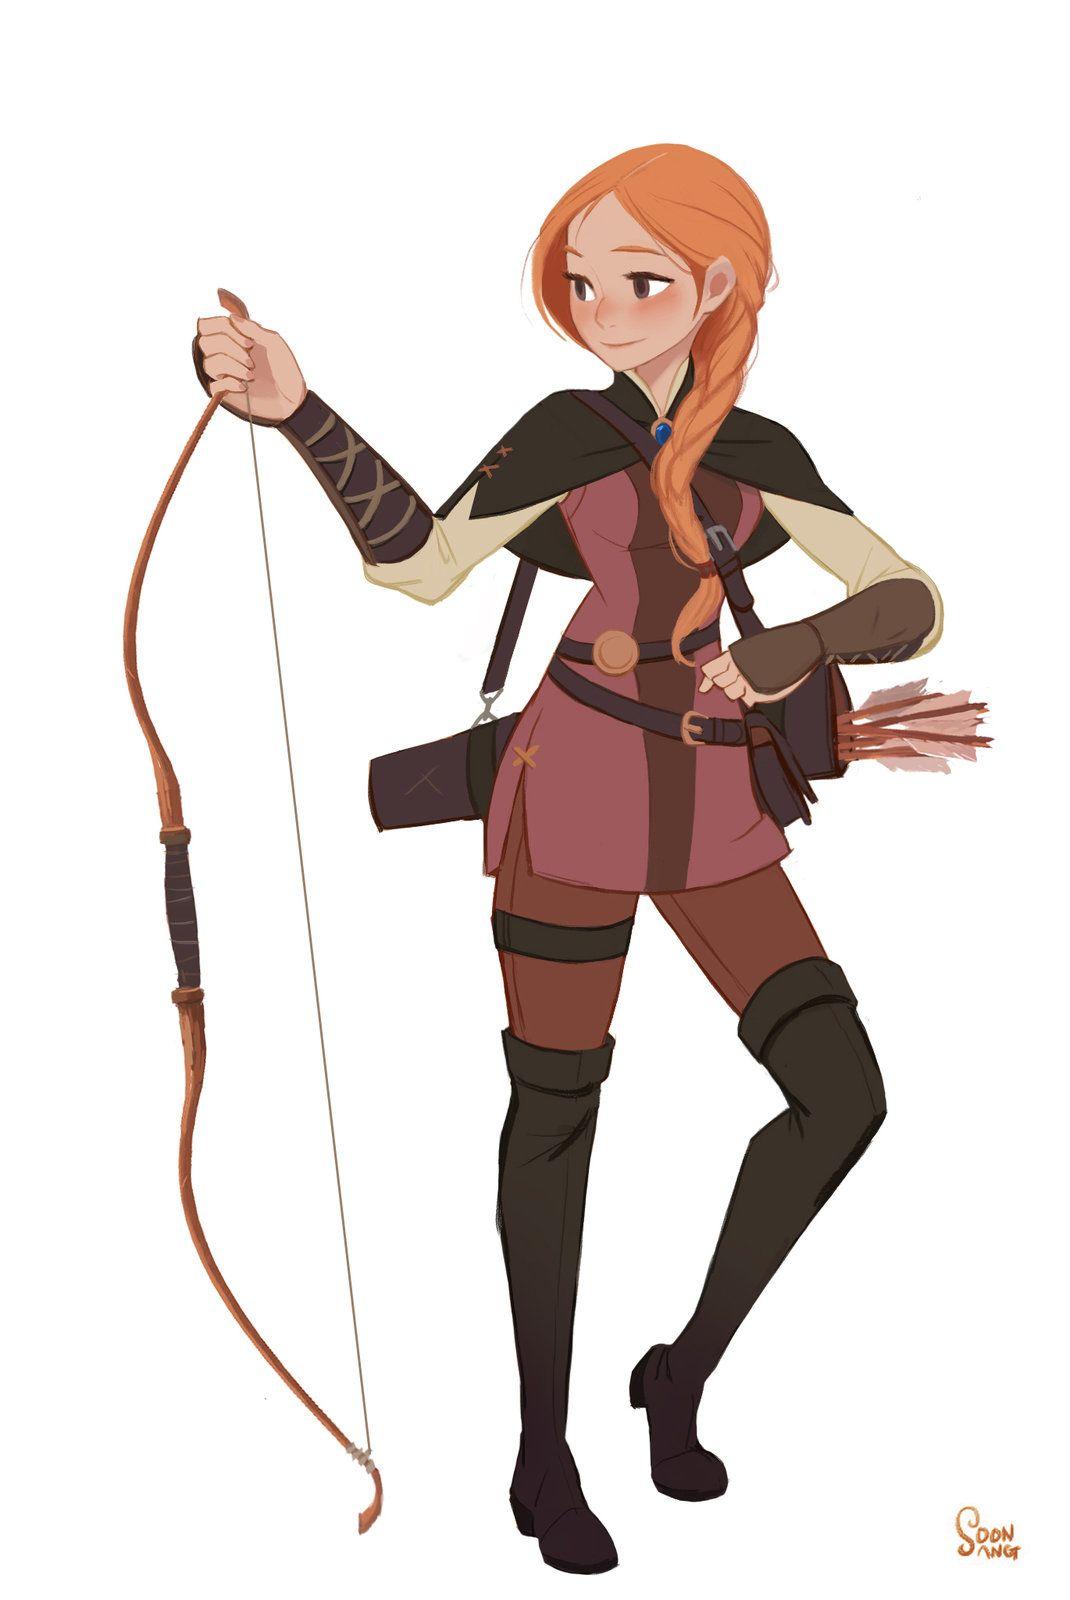 Female Cartoon Characters 80s : Personal project robin hood soon sang hong on